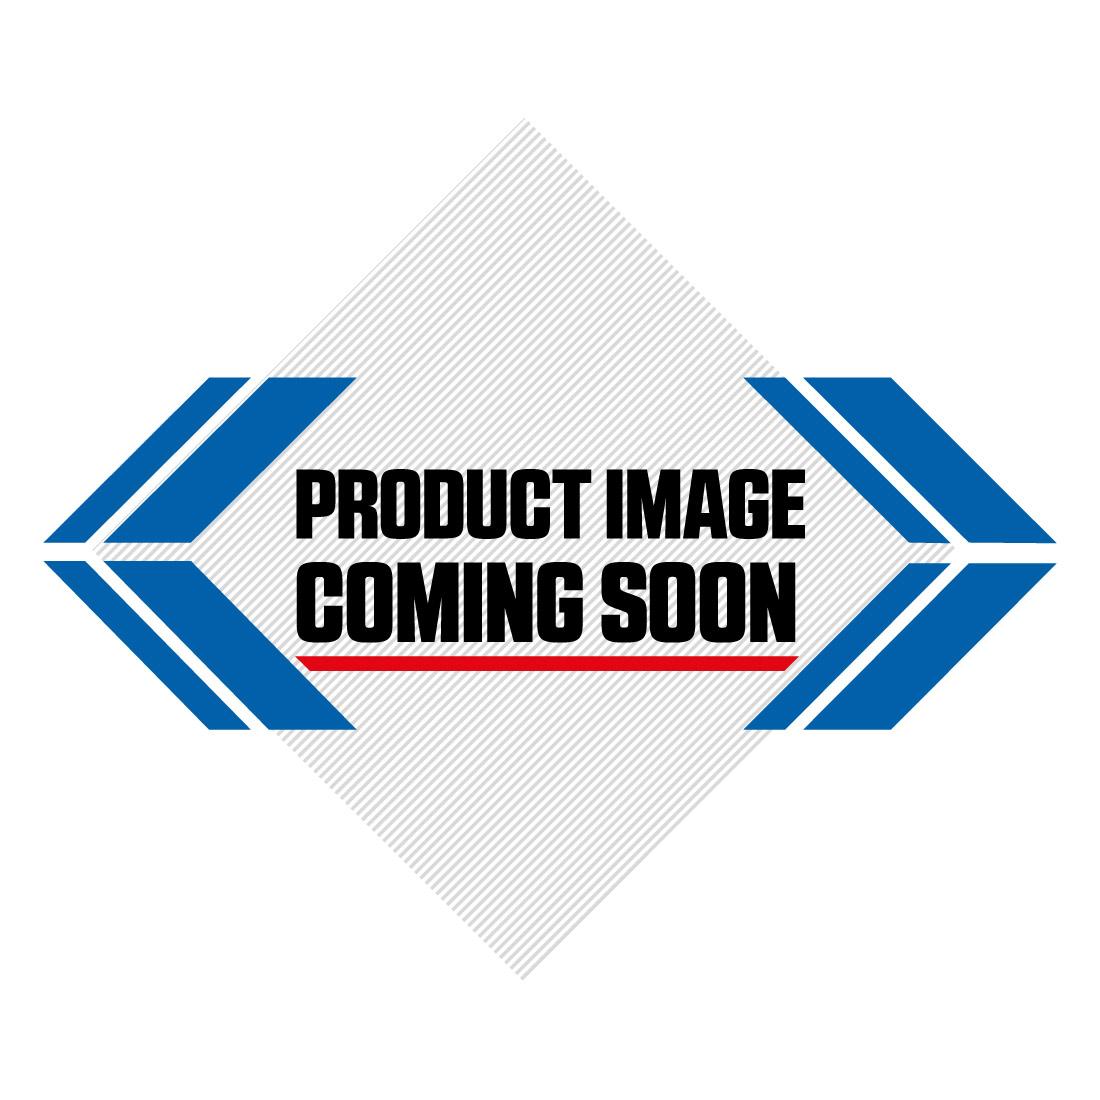 Suzuki Plastic Kit RMZ 450 (08-17) OEM Factory Image-1>